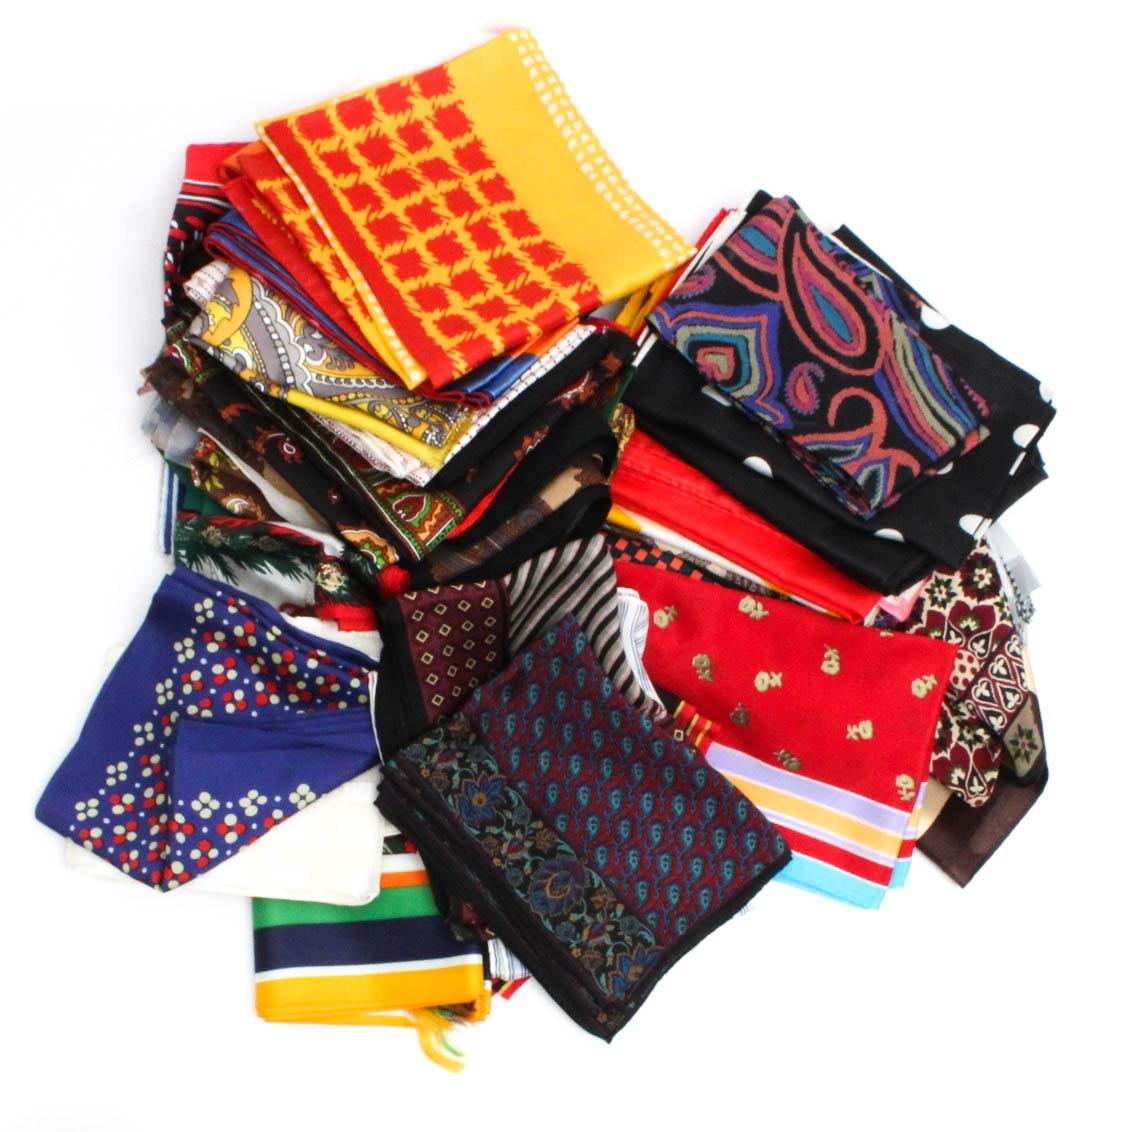 Vintage Silk Scarves and Handmade Kerchiefs